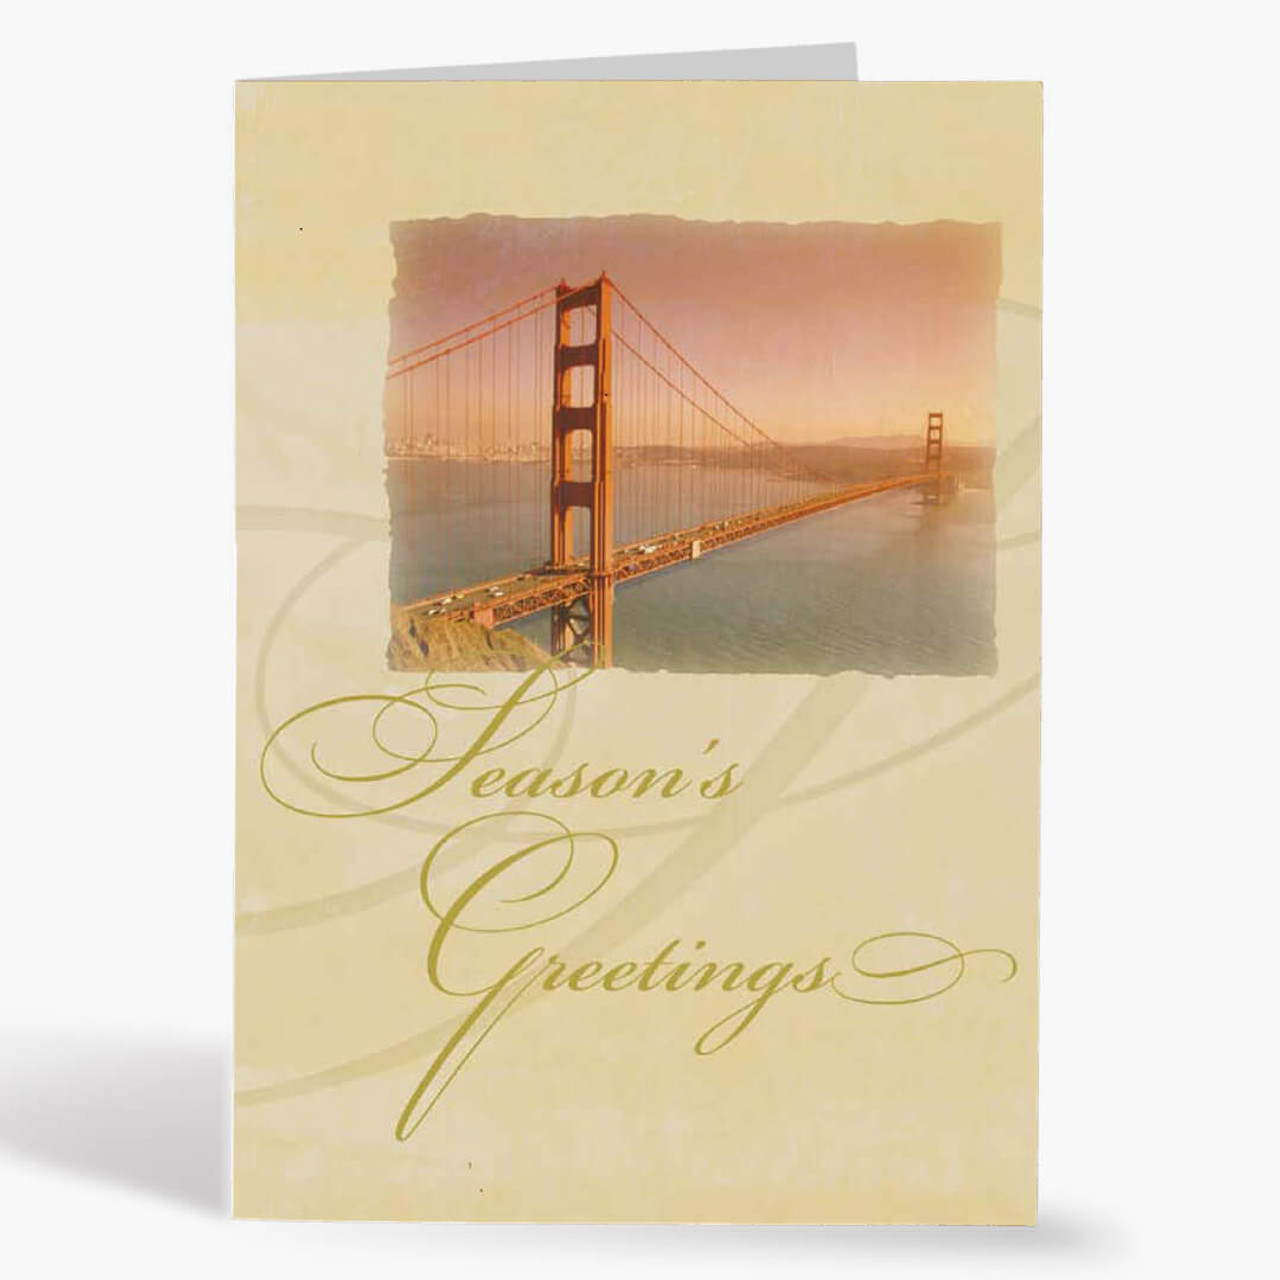 San Francisco Greetings